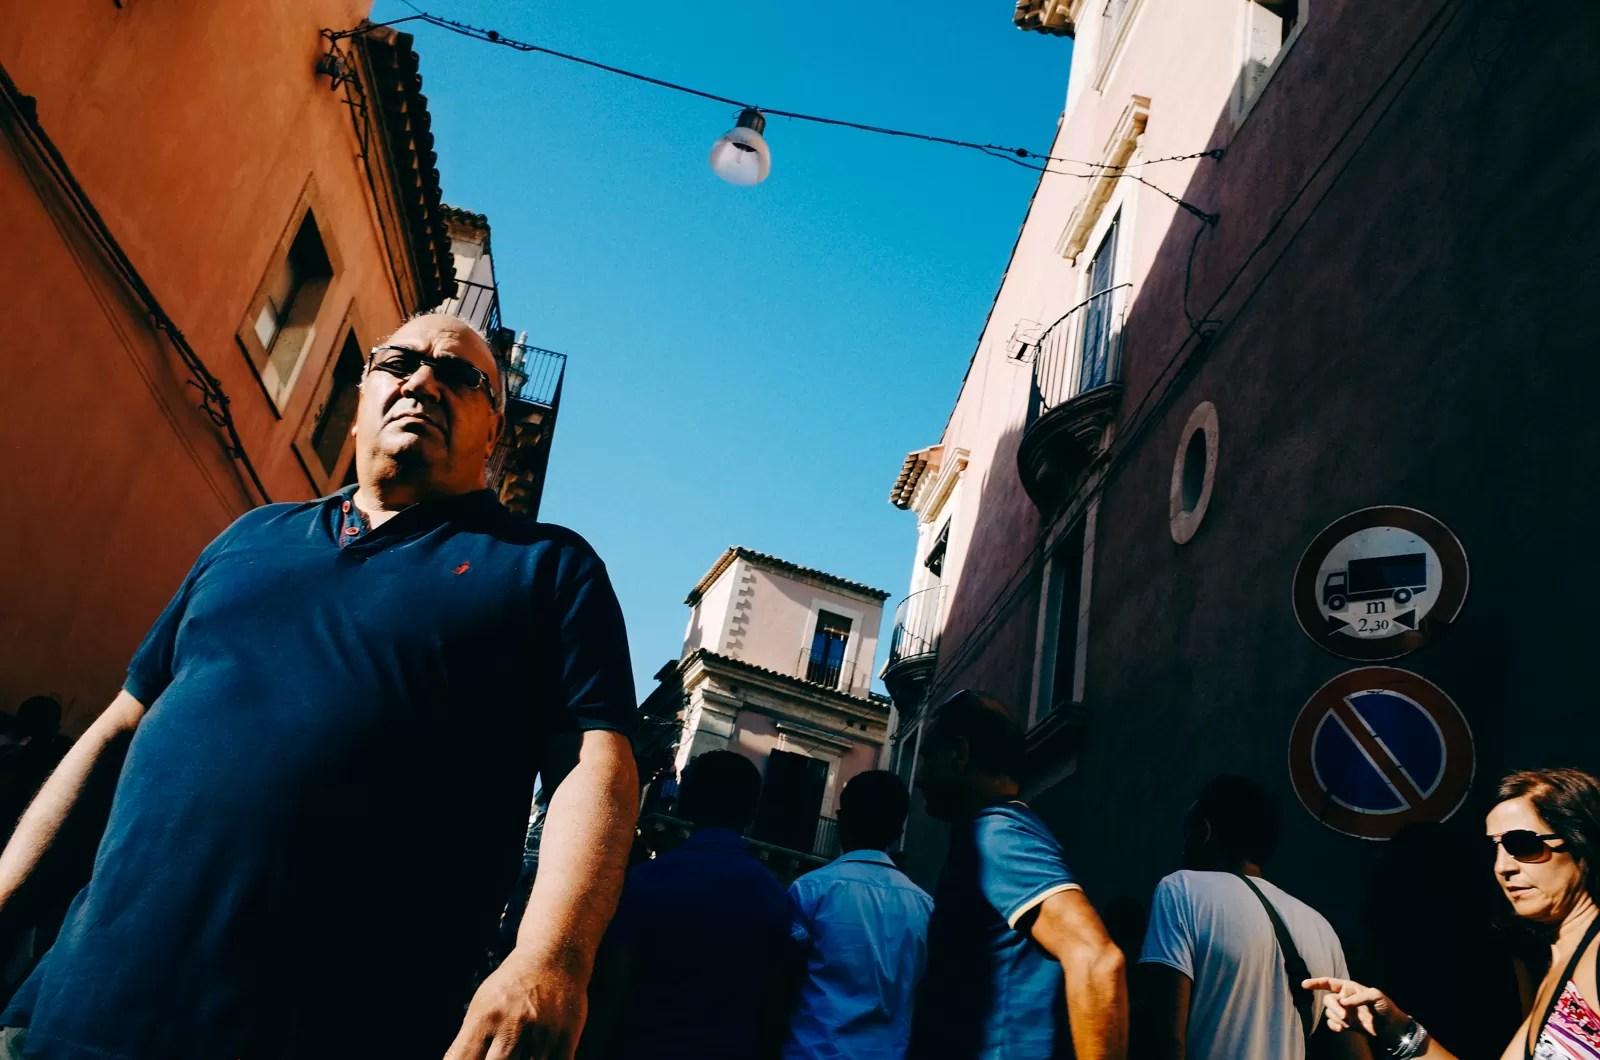 R0004770 - Siciliani in festa 18 Agosto 2015  (Parte 1) Street Photography Session - fotostreet.it